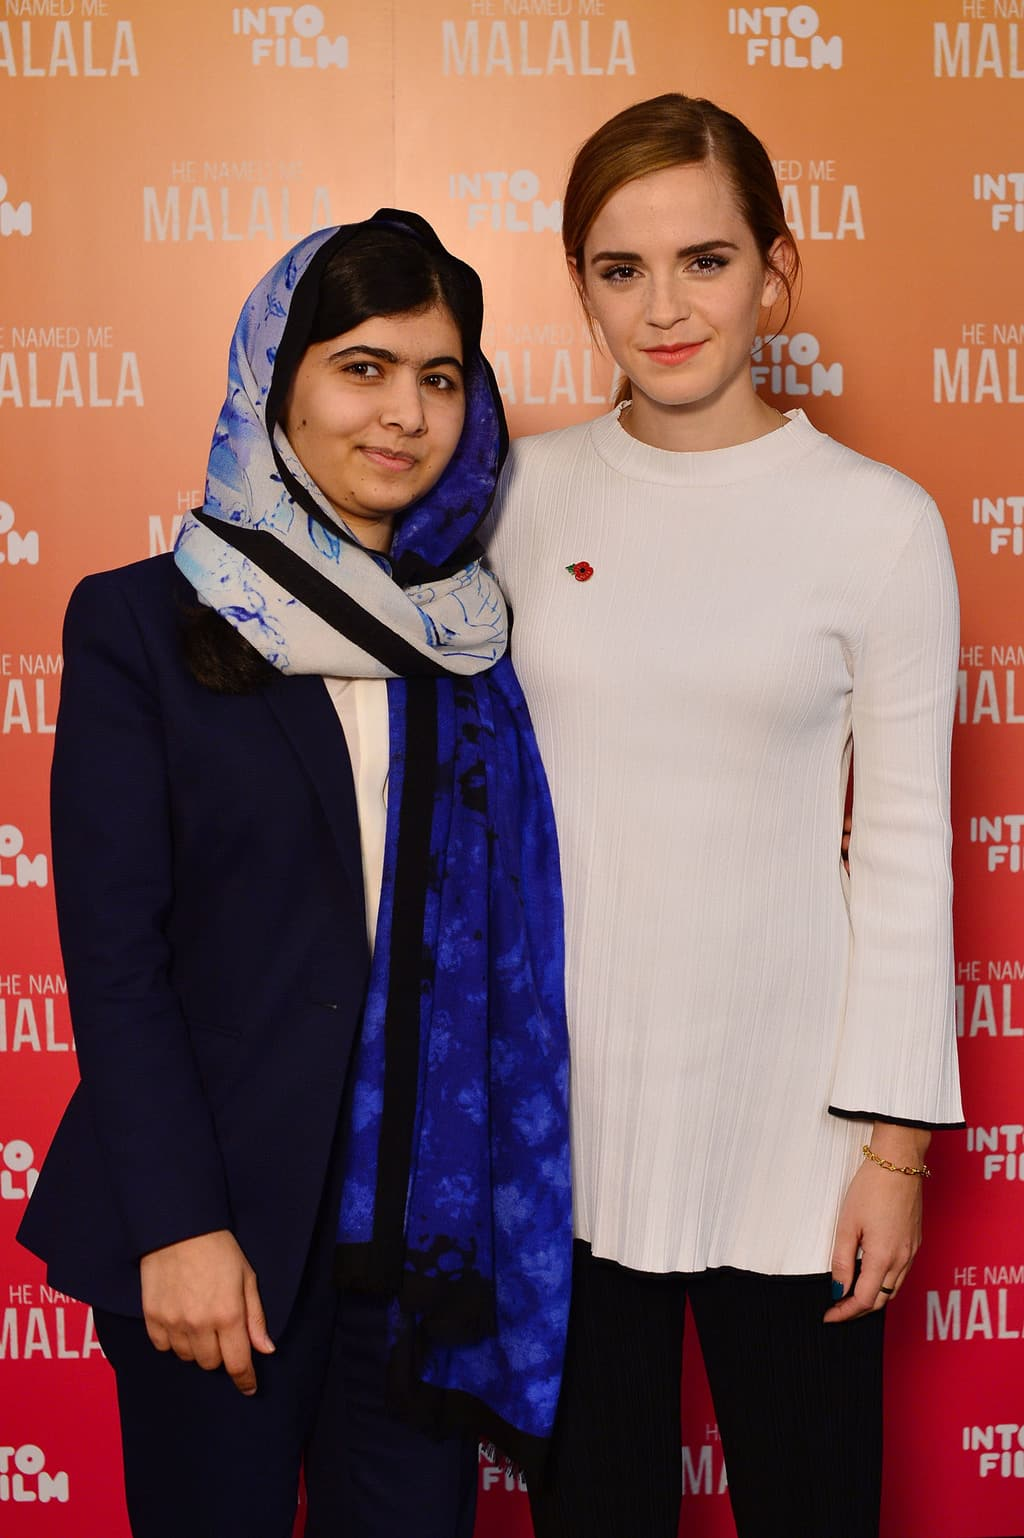 film reviews   movies   features   BRWC Emma Watson Meets Malala Yousafzai